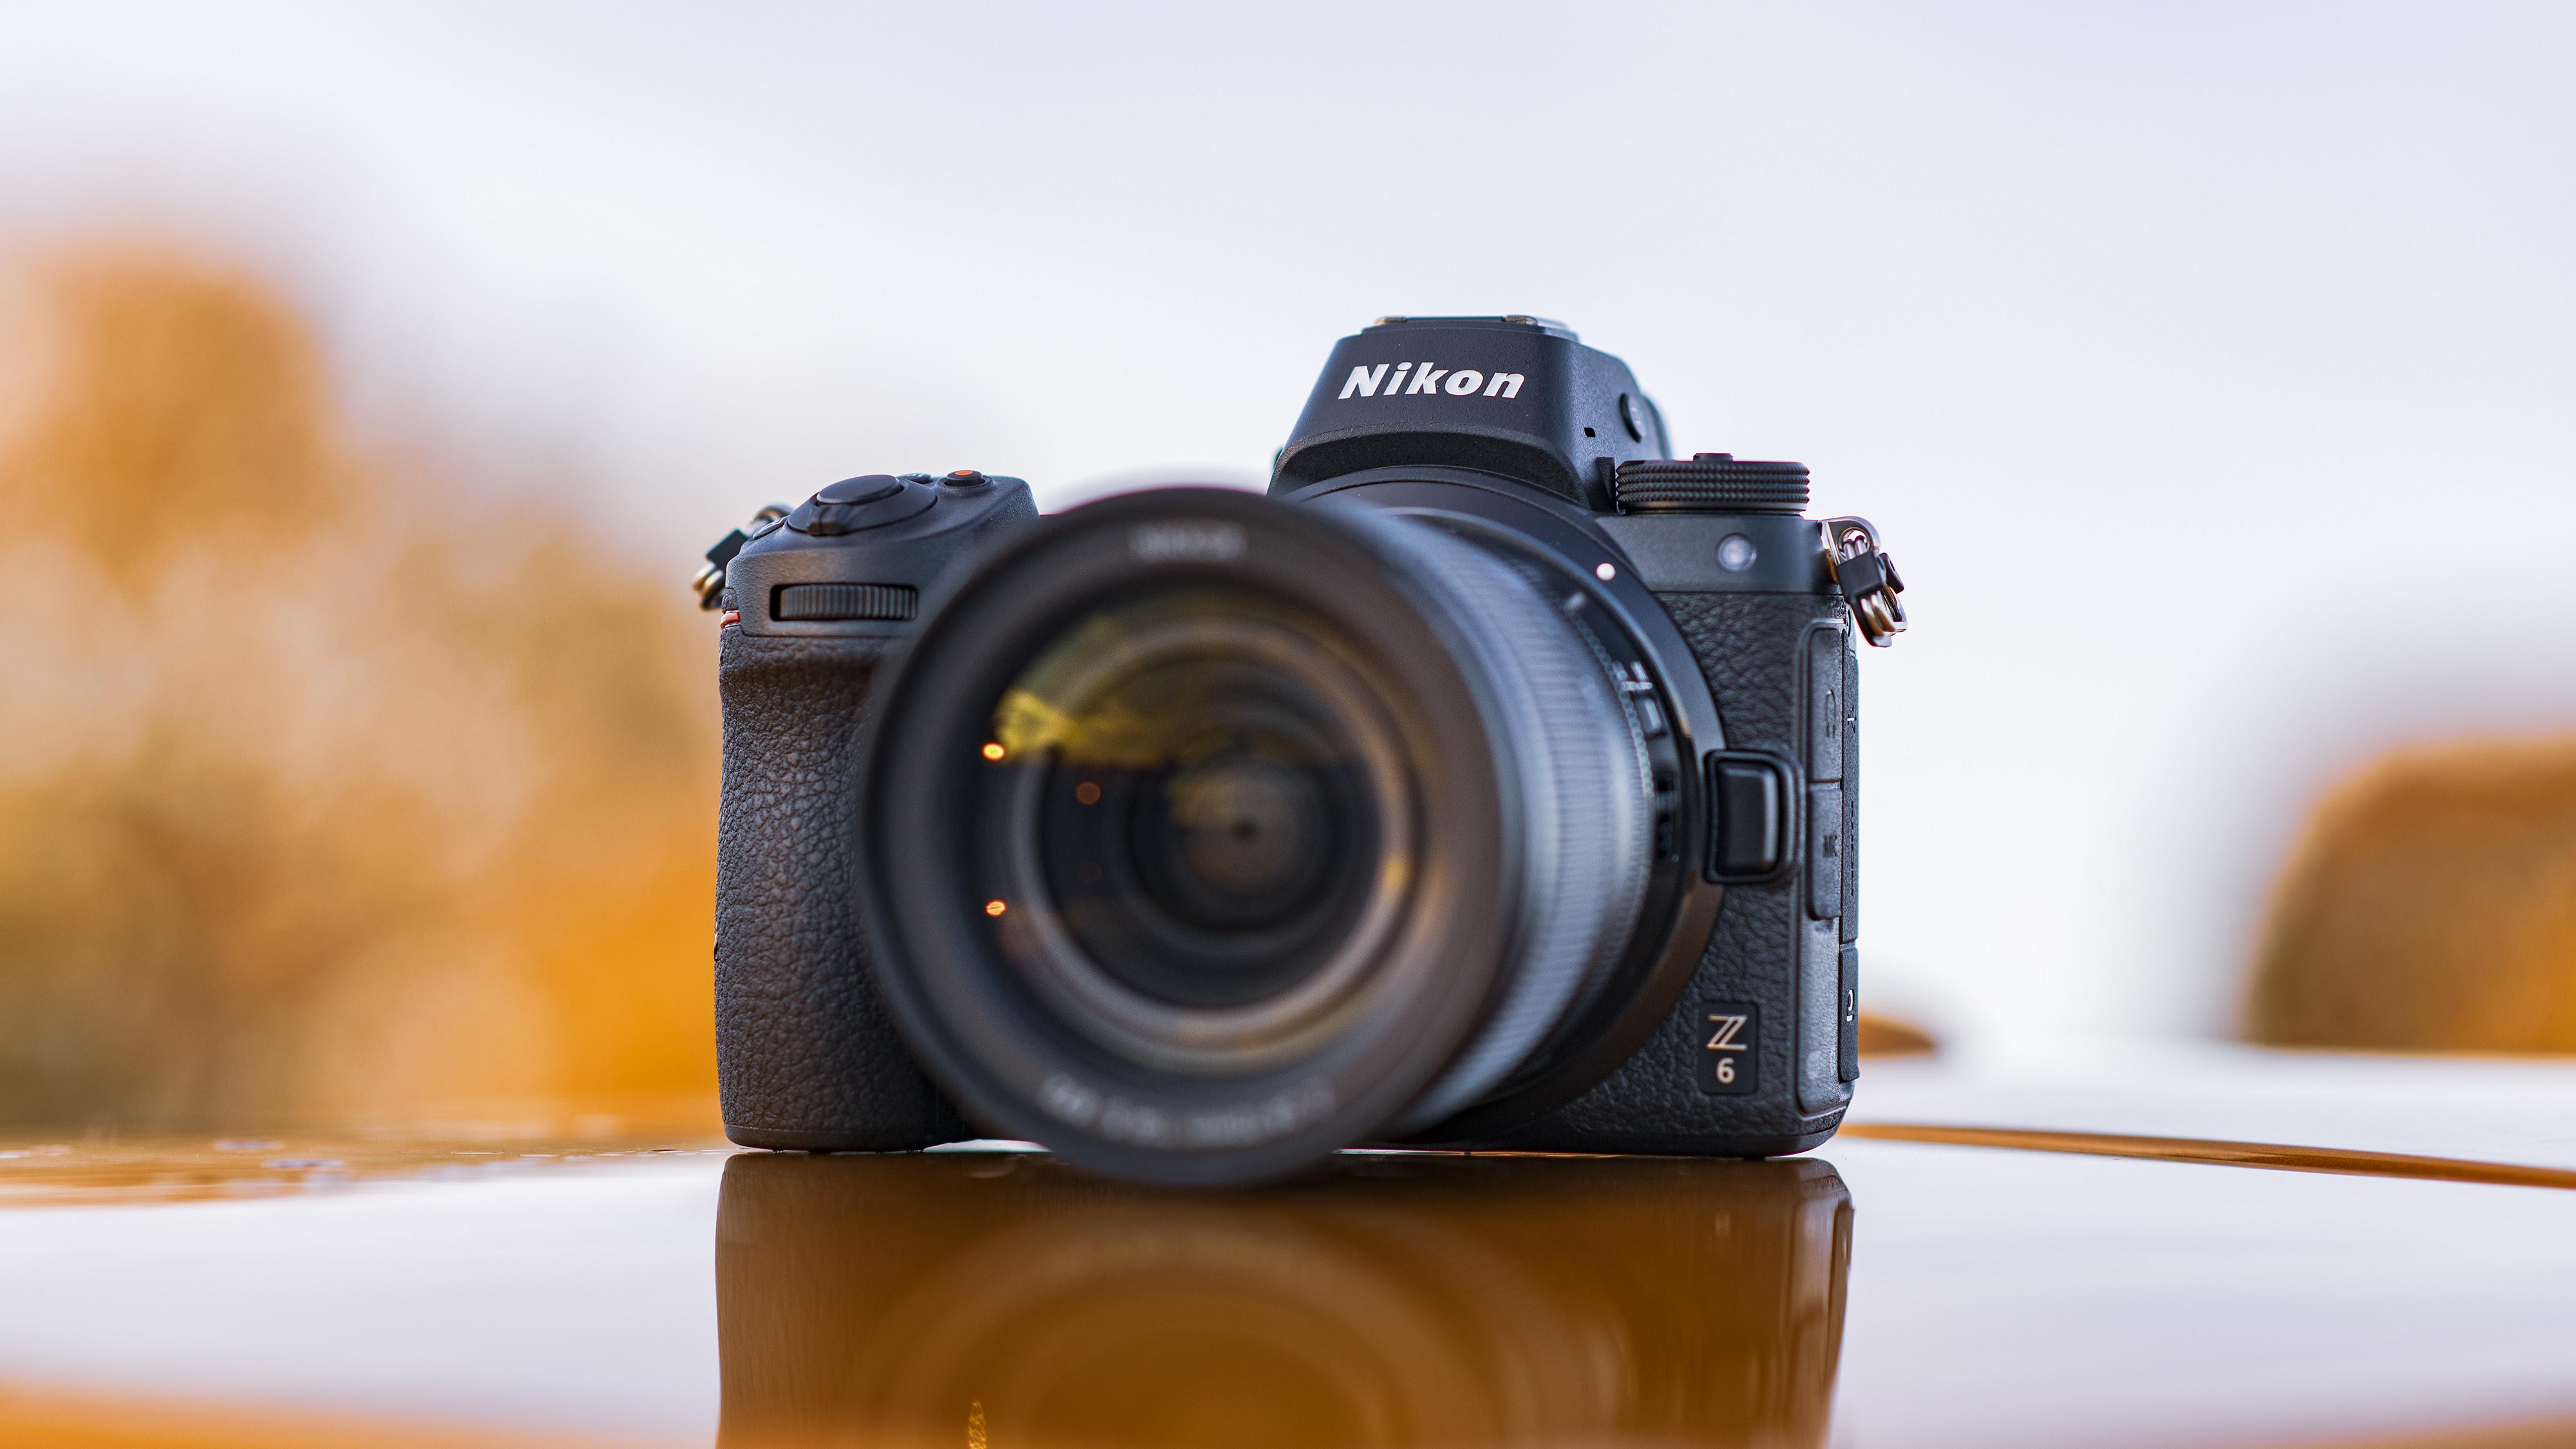 Best mirrorless camera: Nikon Z6